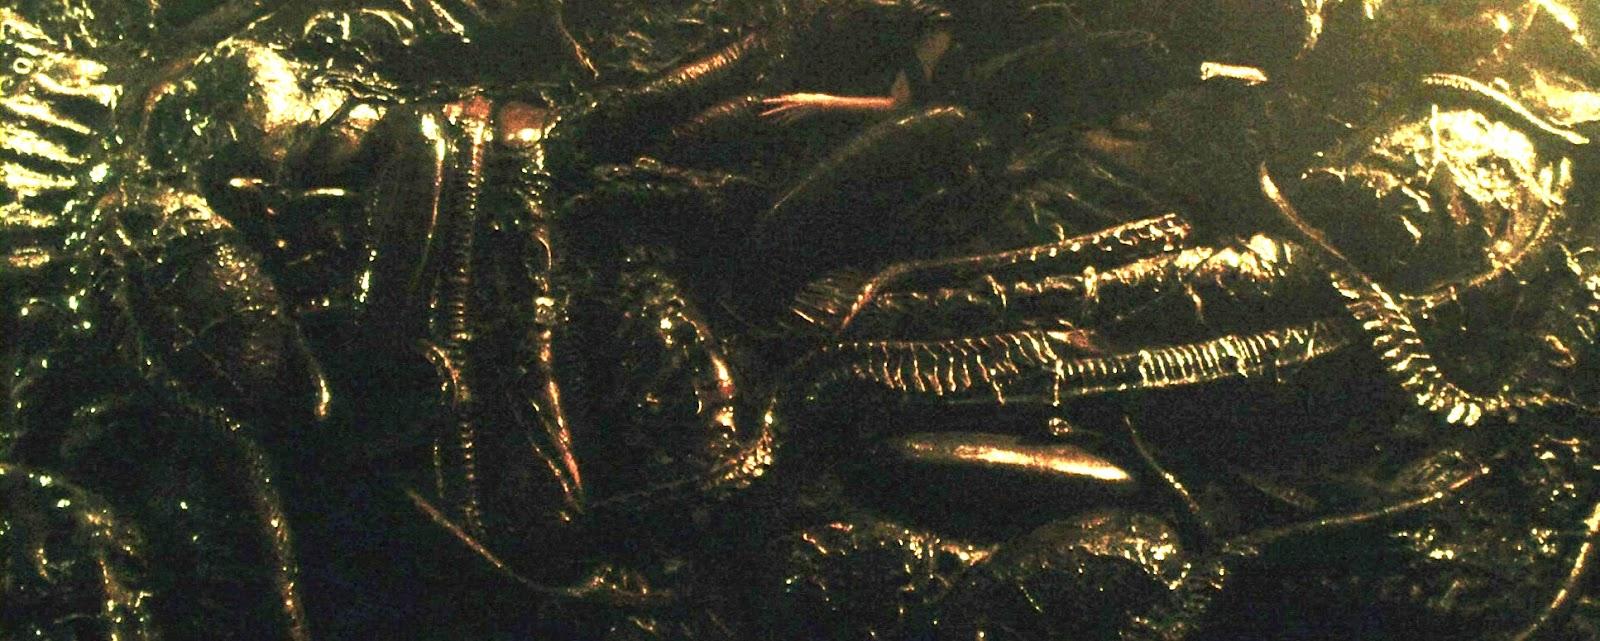 The Viper Pit Nest Alienex Plorations